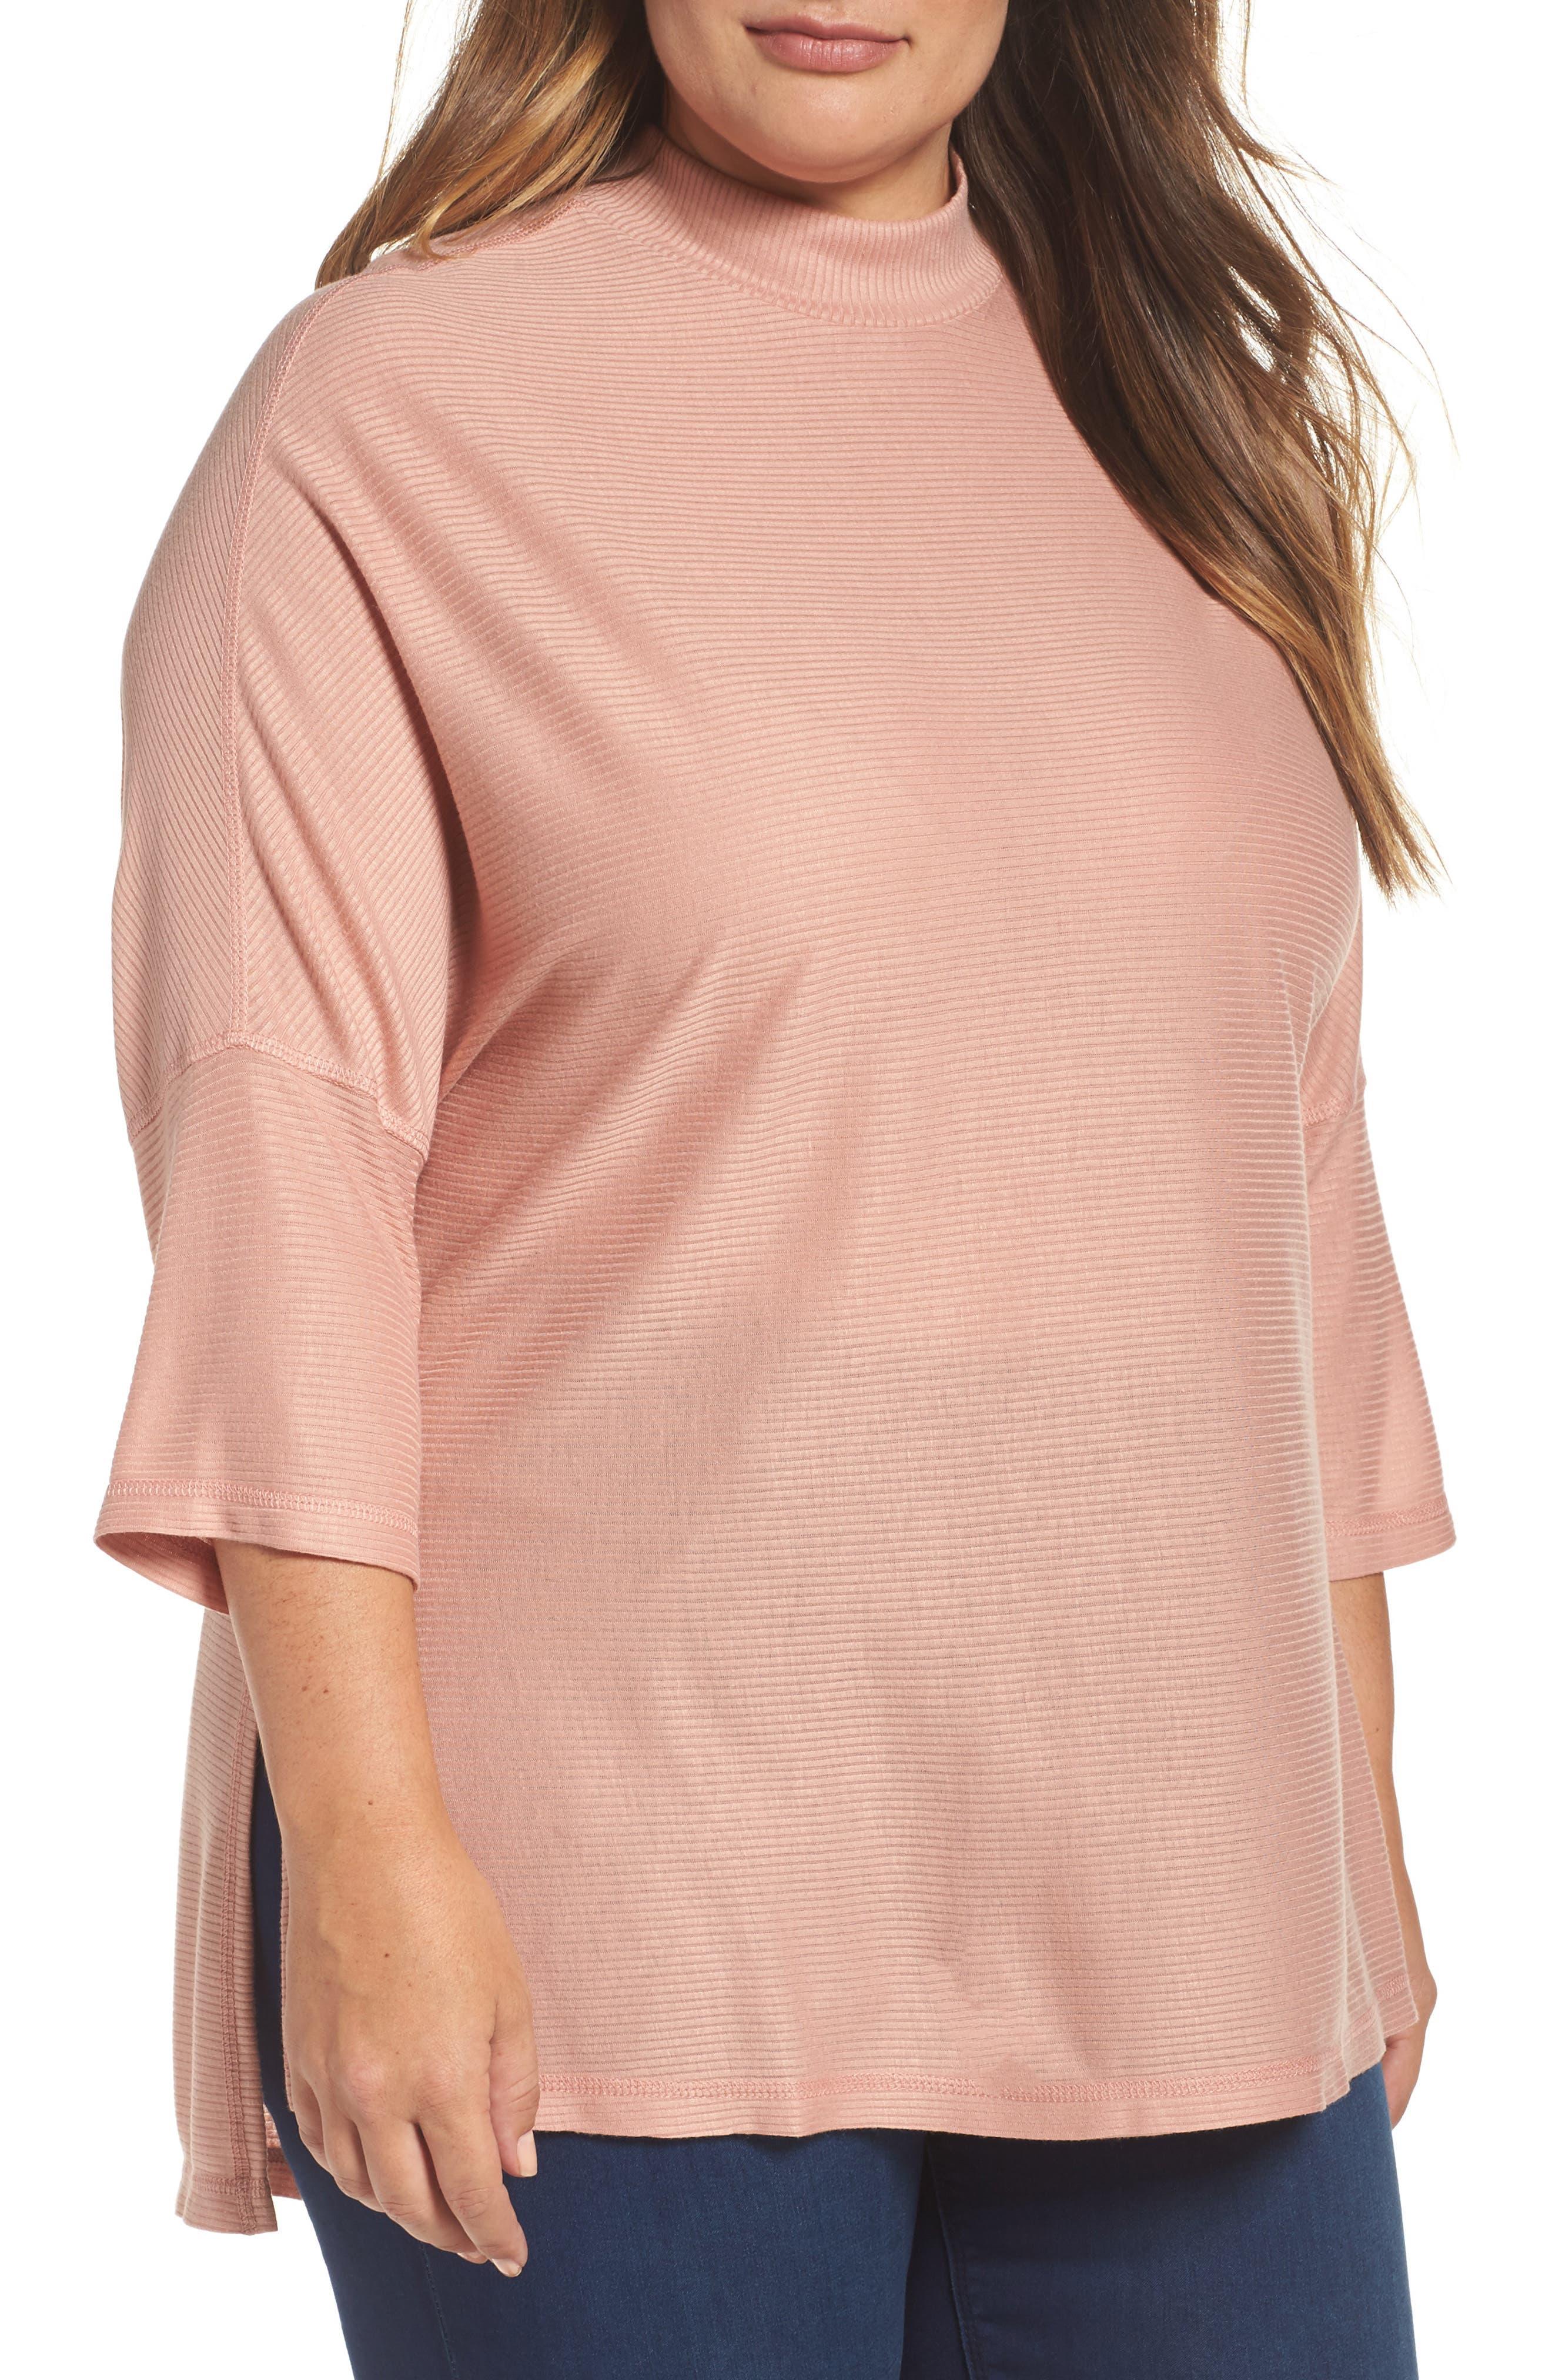 Melissa McCarthy Seven7 Mock Neck Rib Knit Top (Plus Size)